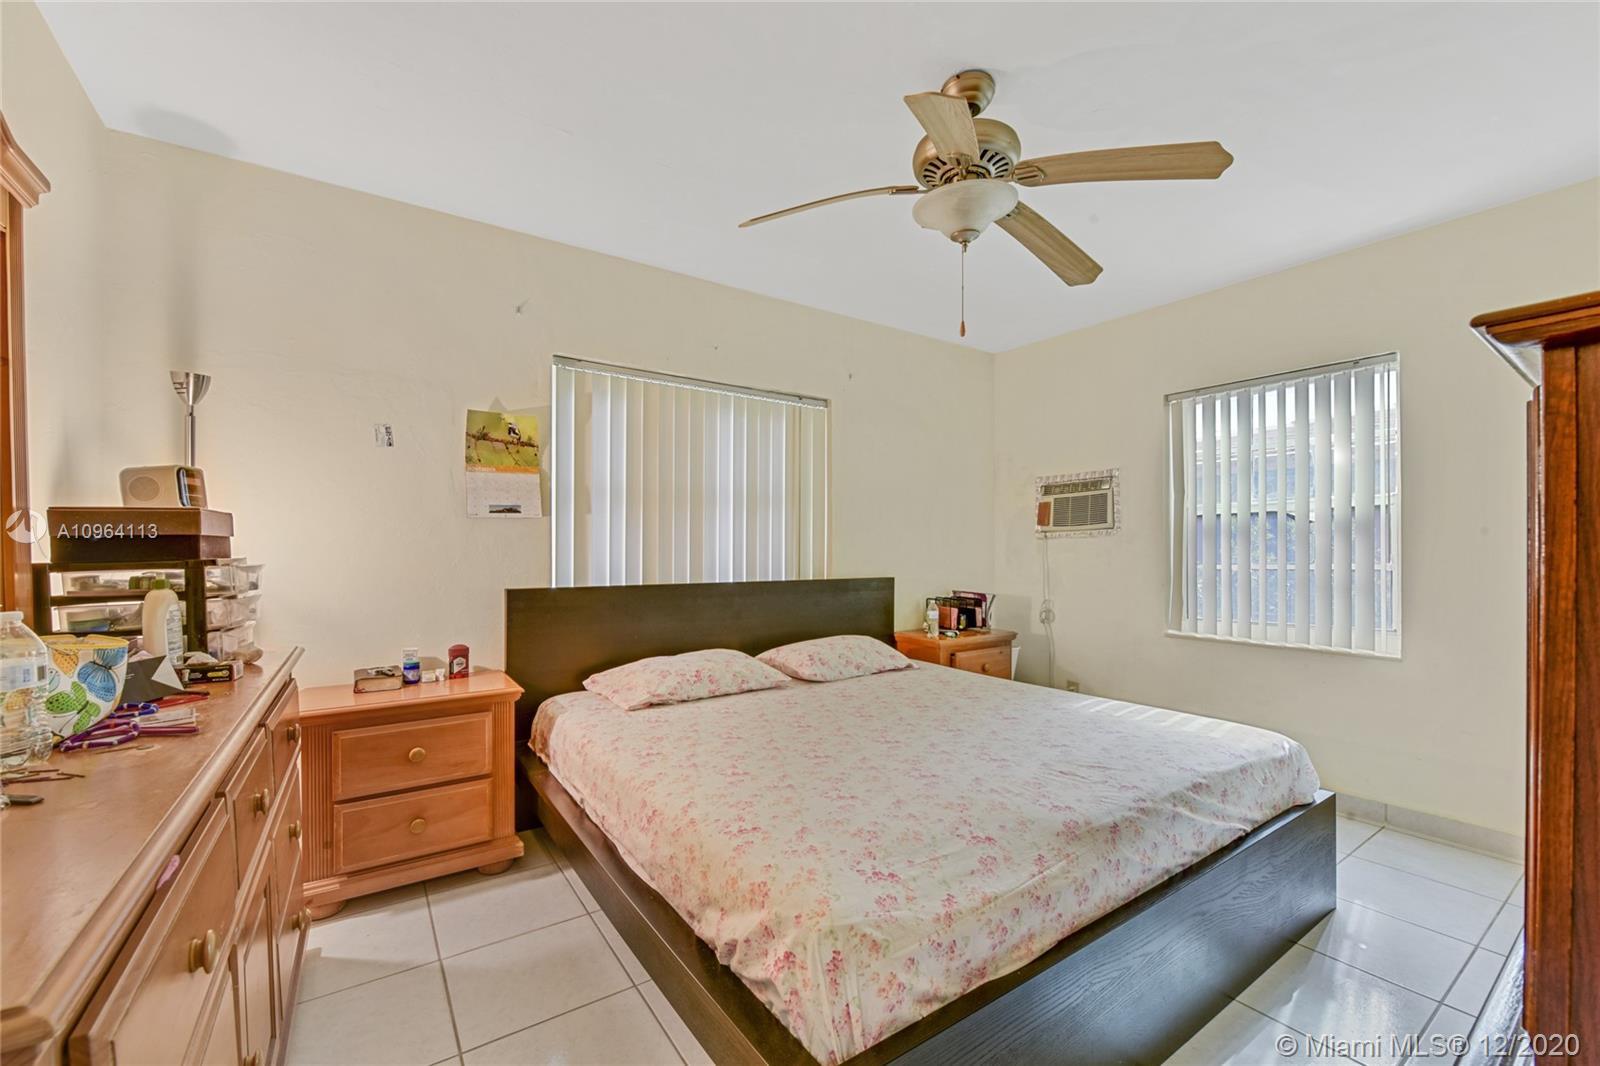 /  2492 sq. ft. $ 2020-12-10 0 Photo